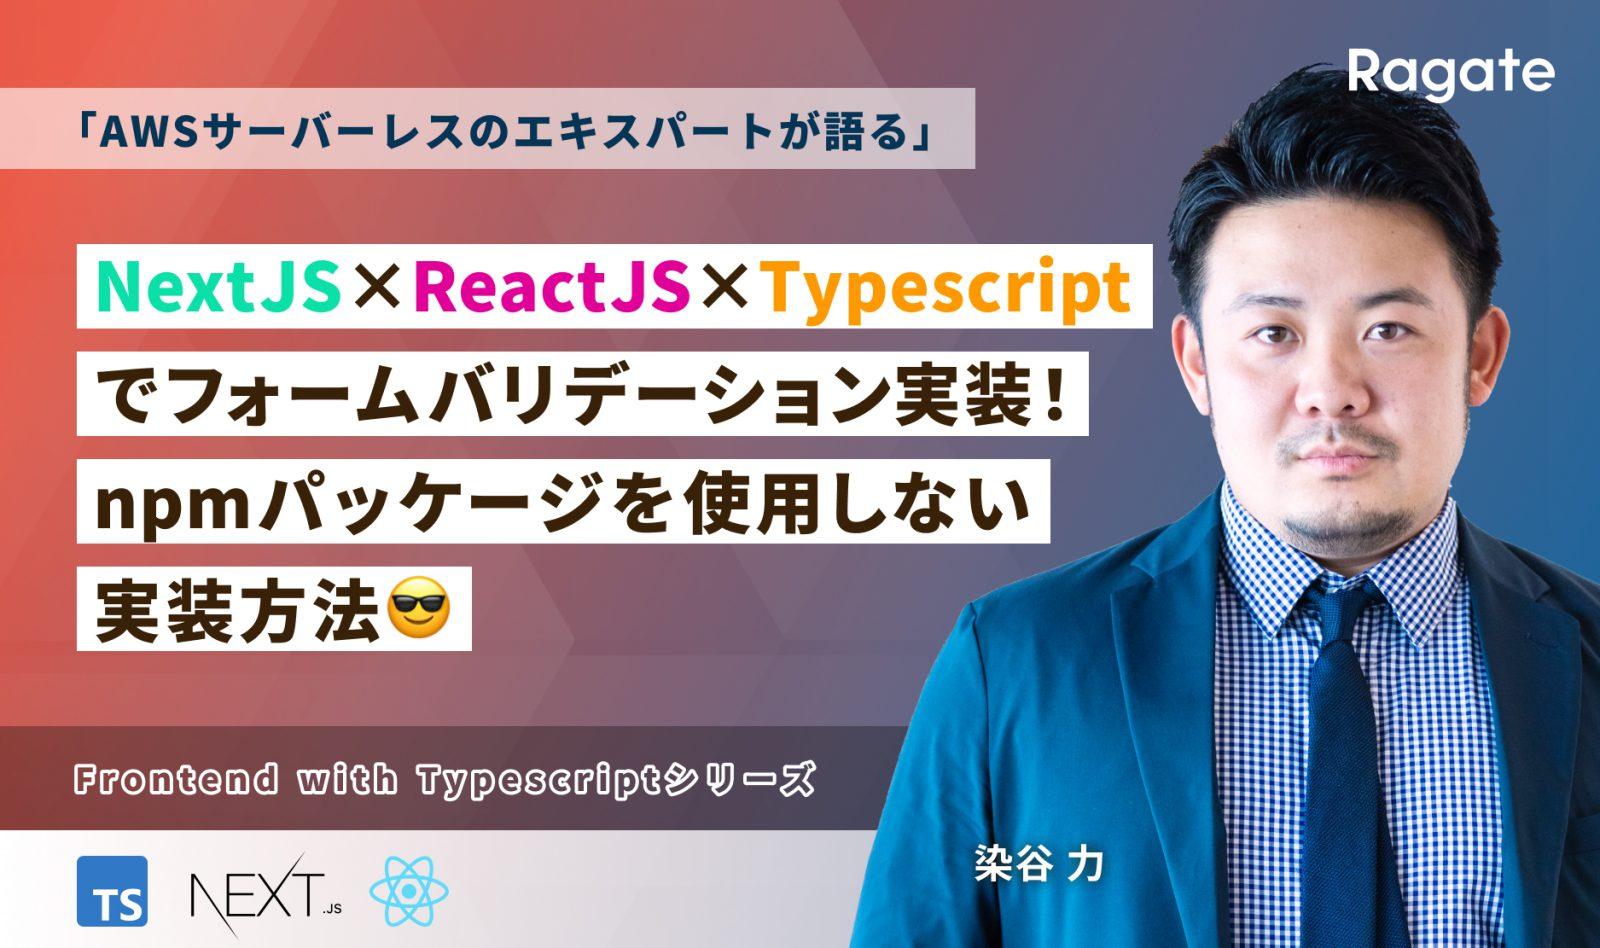 NextJS×ReactJS× Typescriptでフォームバリデーション実装!npmパッケージを使用しない実装方法😎